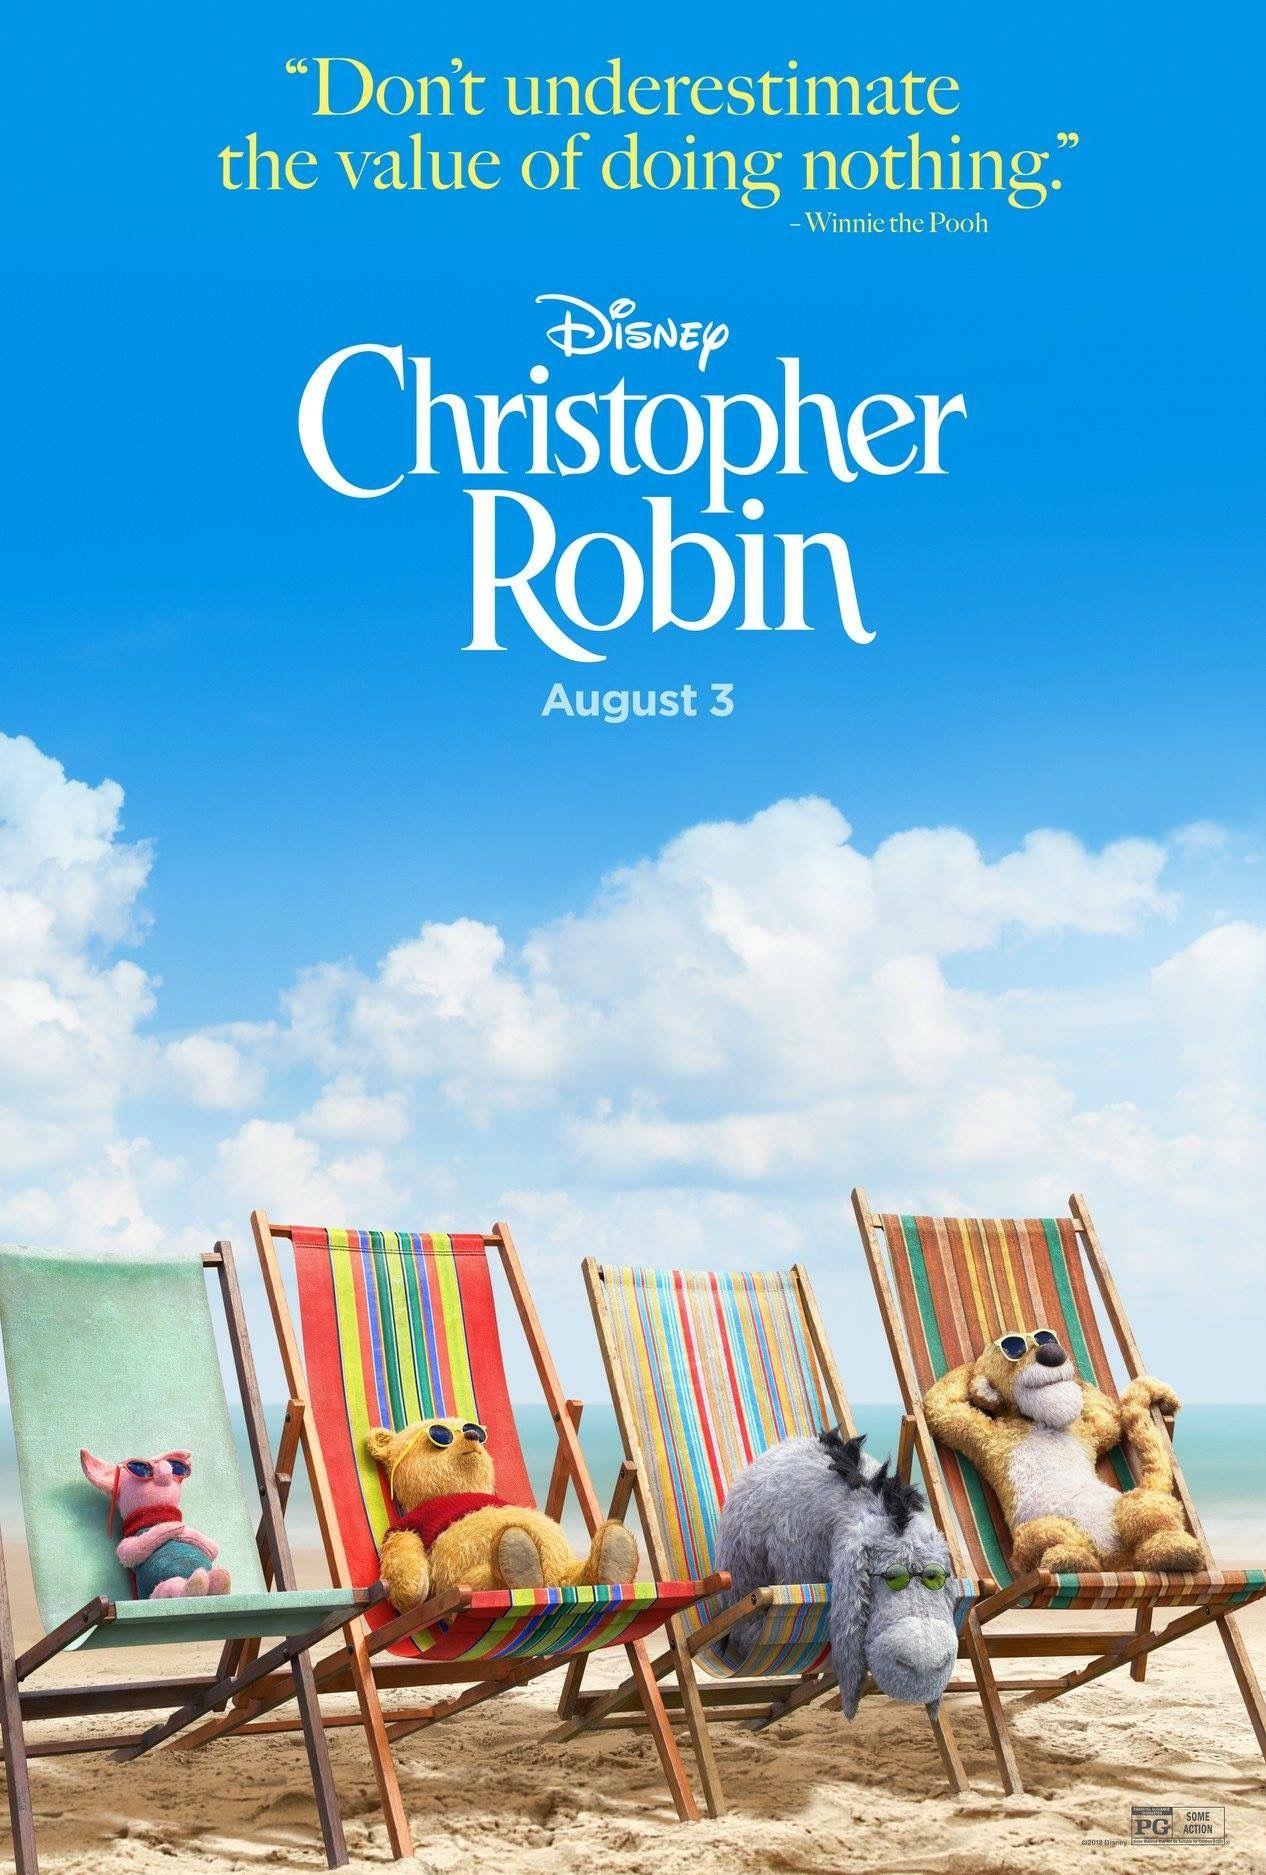 christopher robin august 3 2018 christopher robin 2018 winnie rh pinterest com Tigger Christopher Robin 2018 Christopher Robin 2018 Adult Christopher Robin